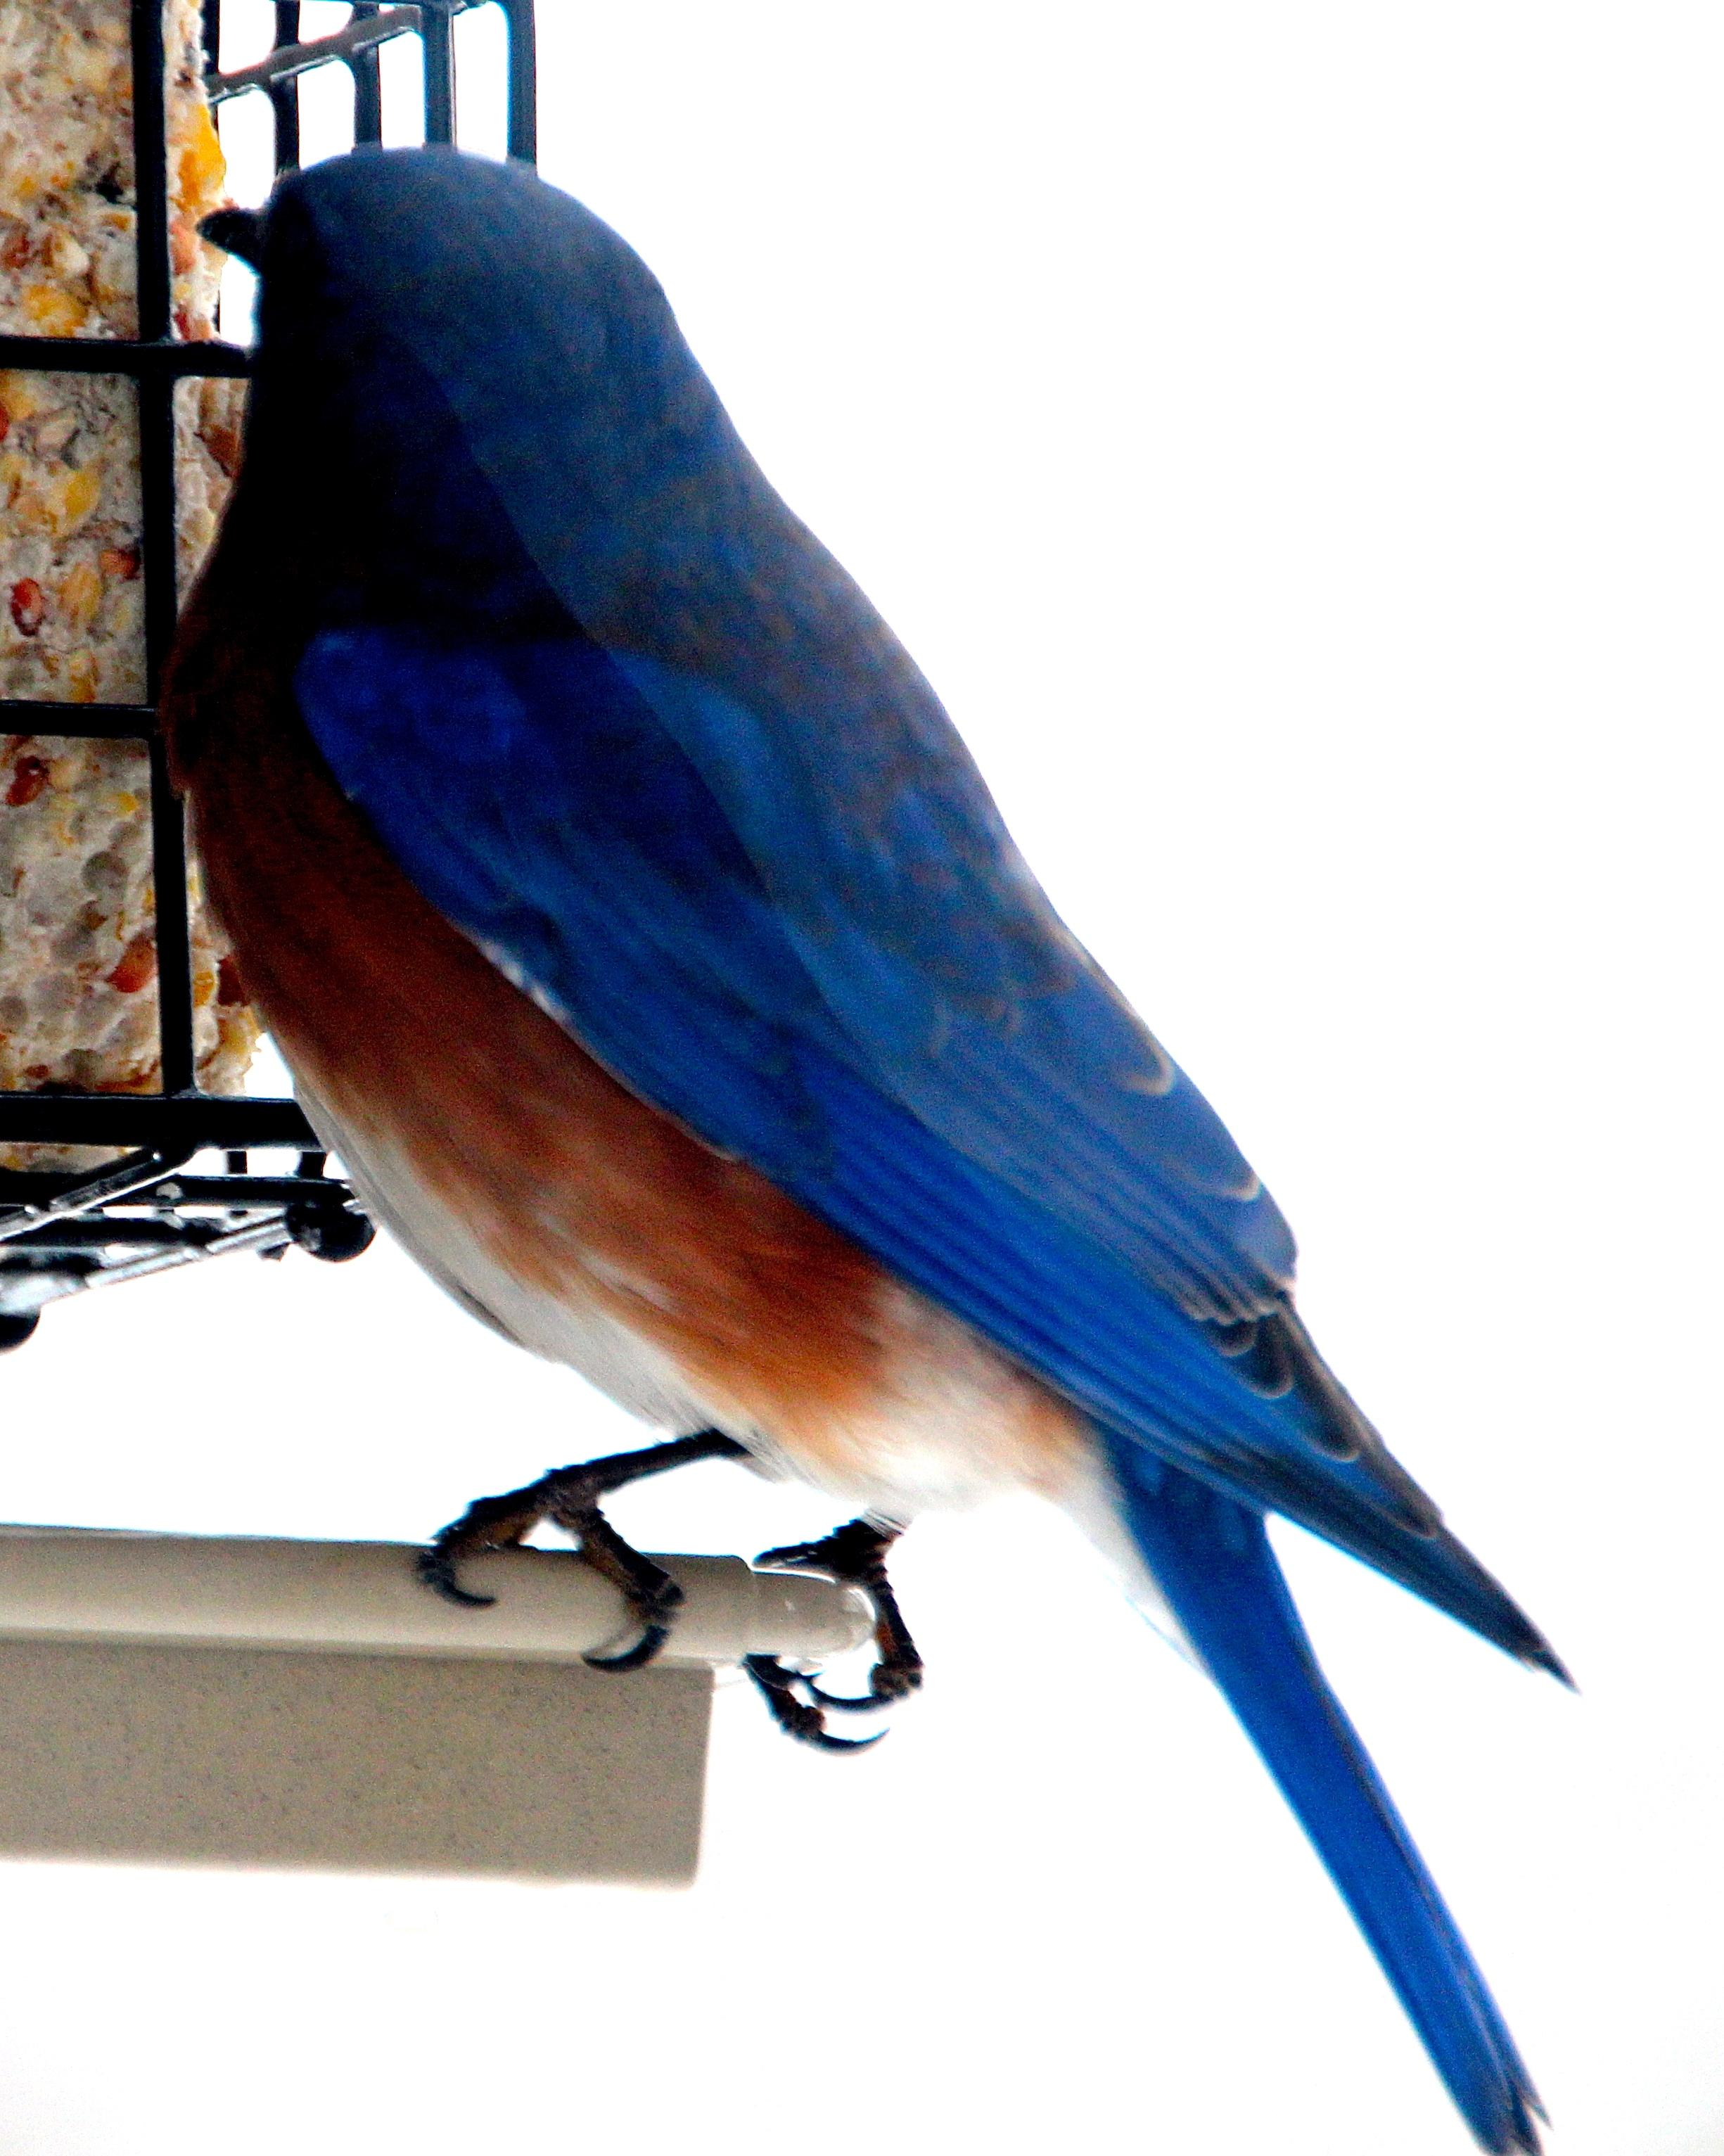 Bluebird at feeder